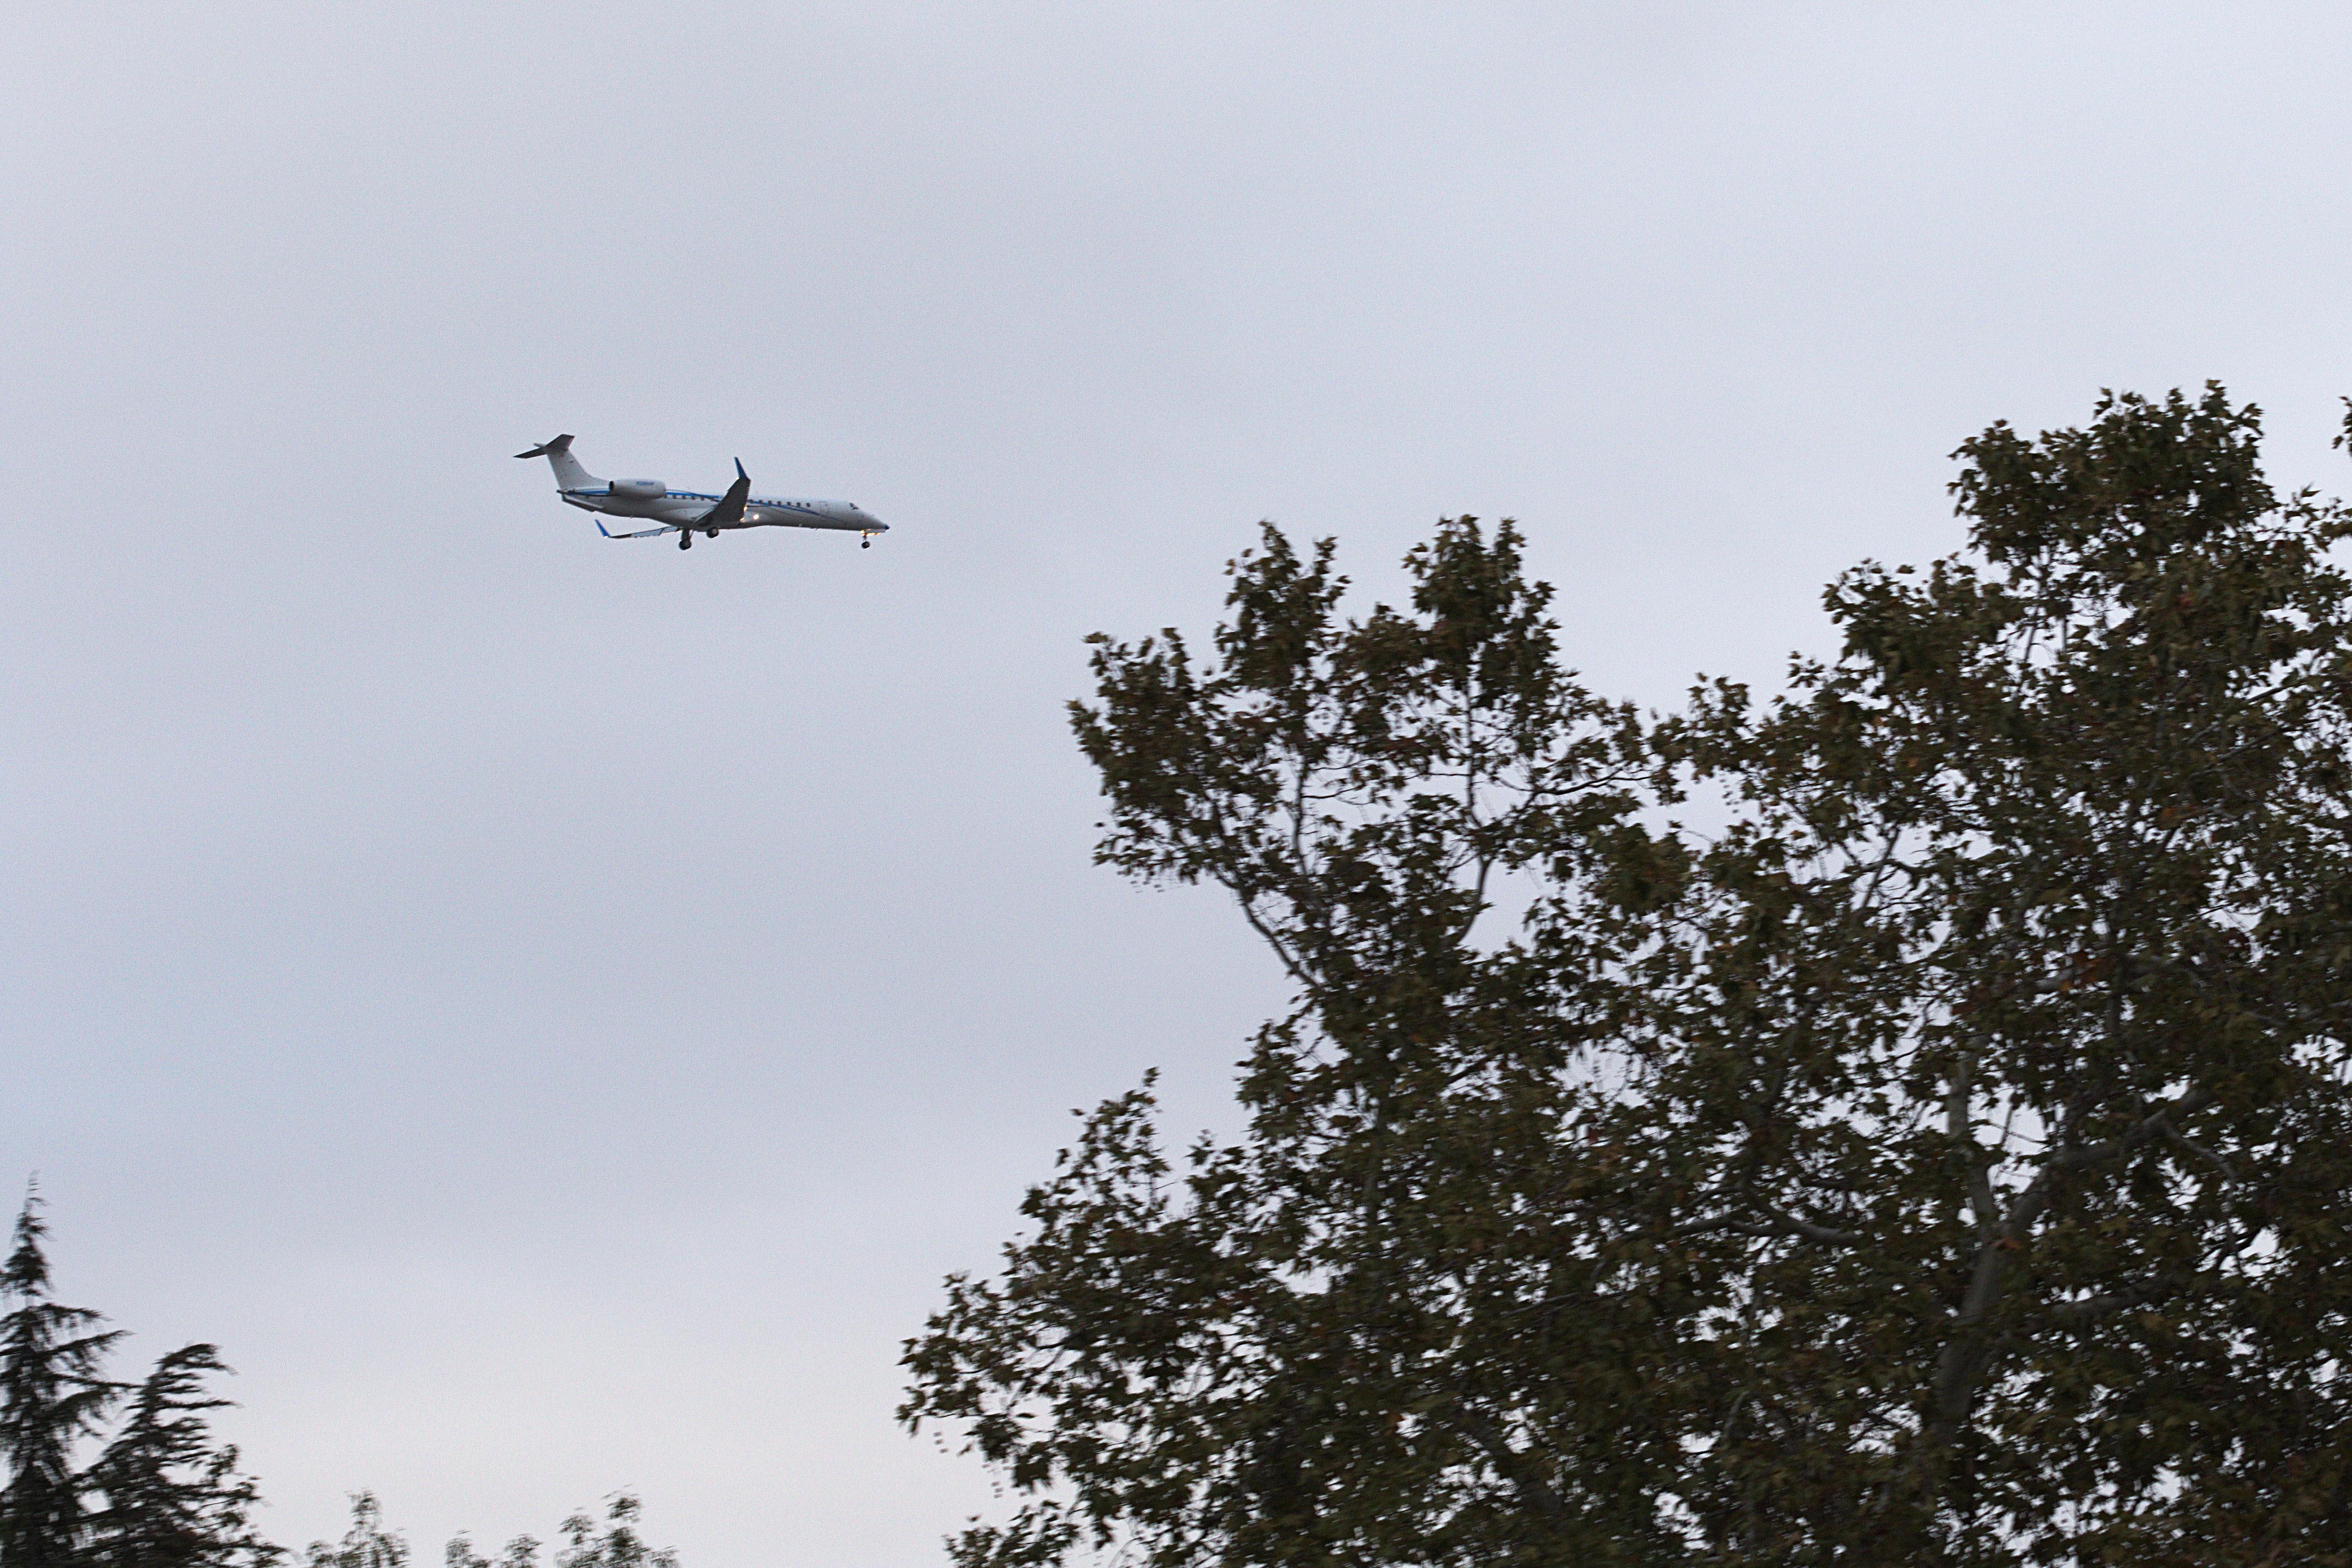 SMC_3009_plane_landing.jpg